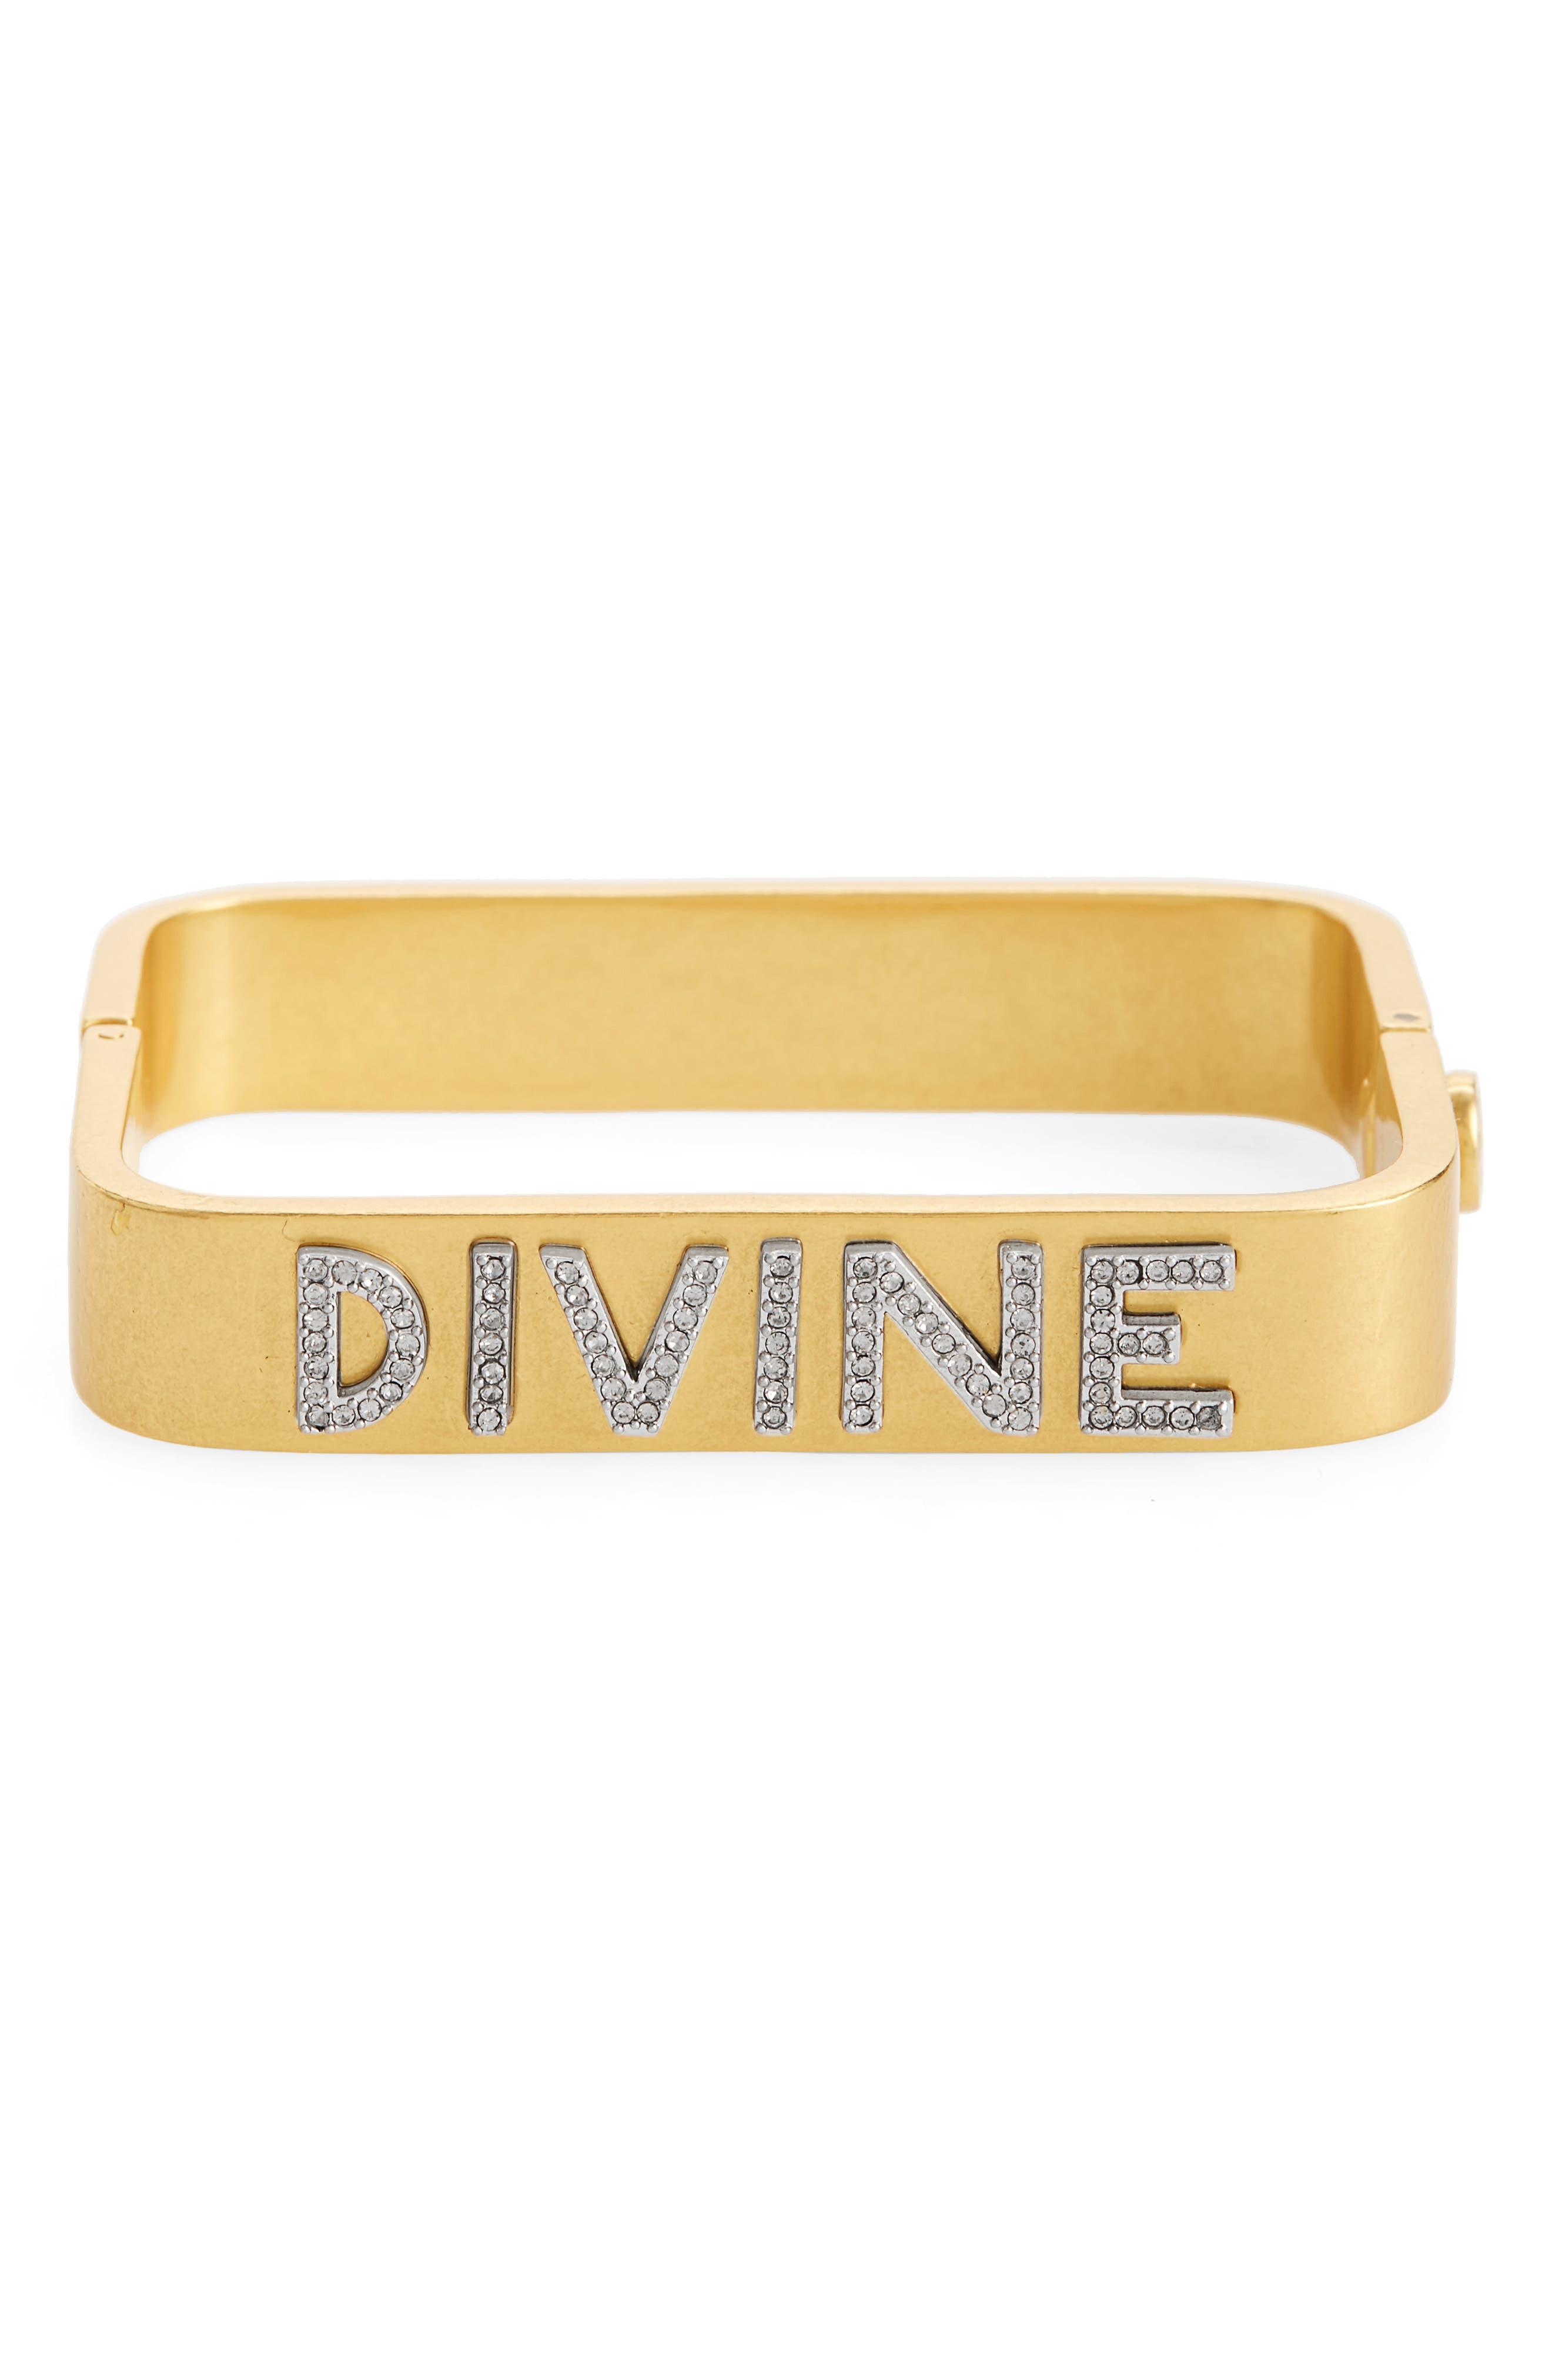 Tory Burch Divine Message Rectangular Bracelet